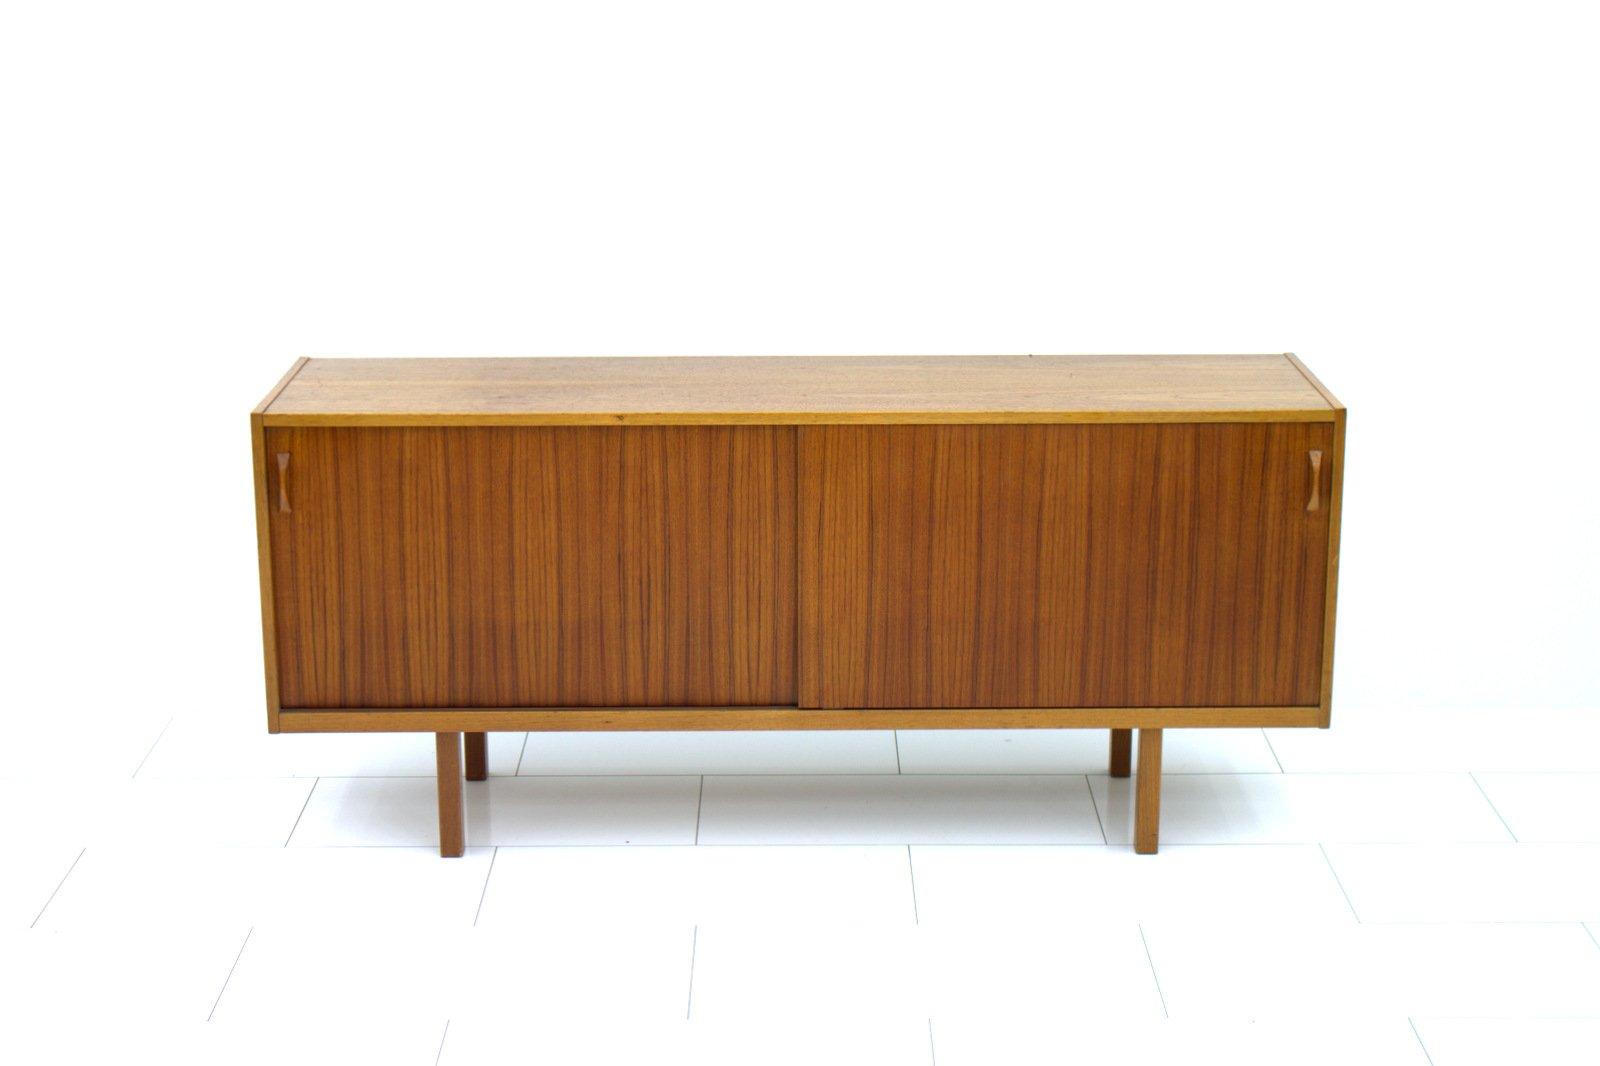 swedish teak sideboard with sliding doors 1960s for sale at pamono. Black Bedroom Furniture Sets. Home Design Ideas